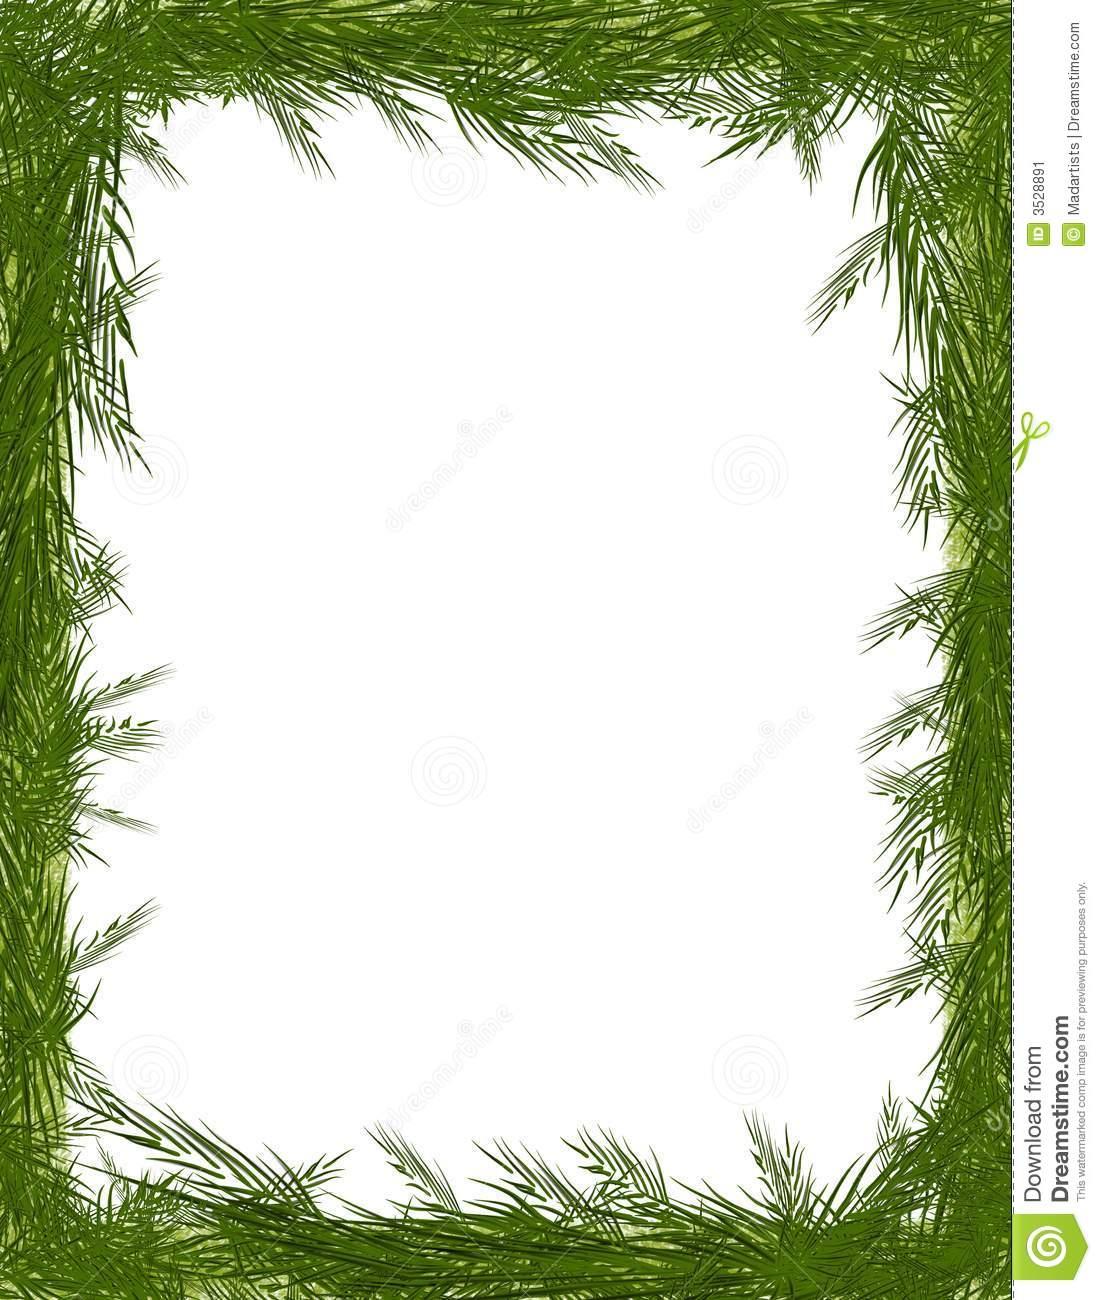 Borders Around Trees: [42+] Wallpaper Borders With Pine Trees On WallpaperSafari